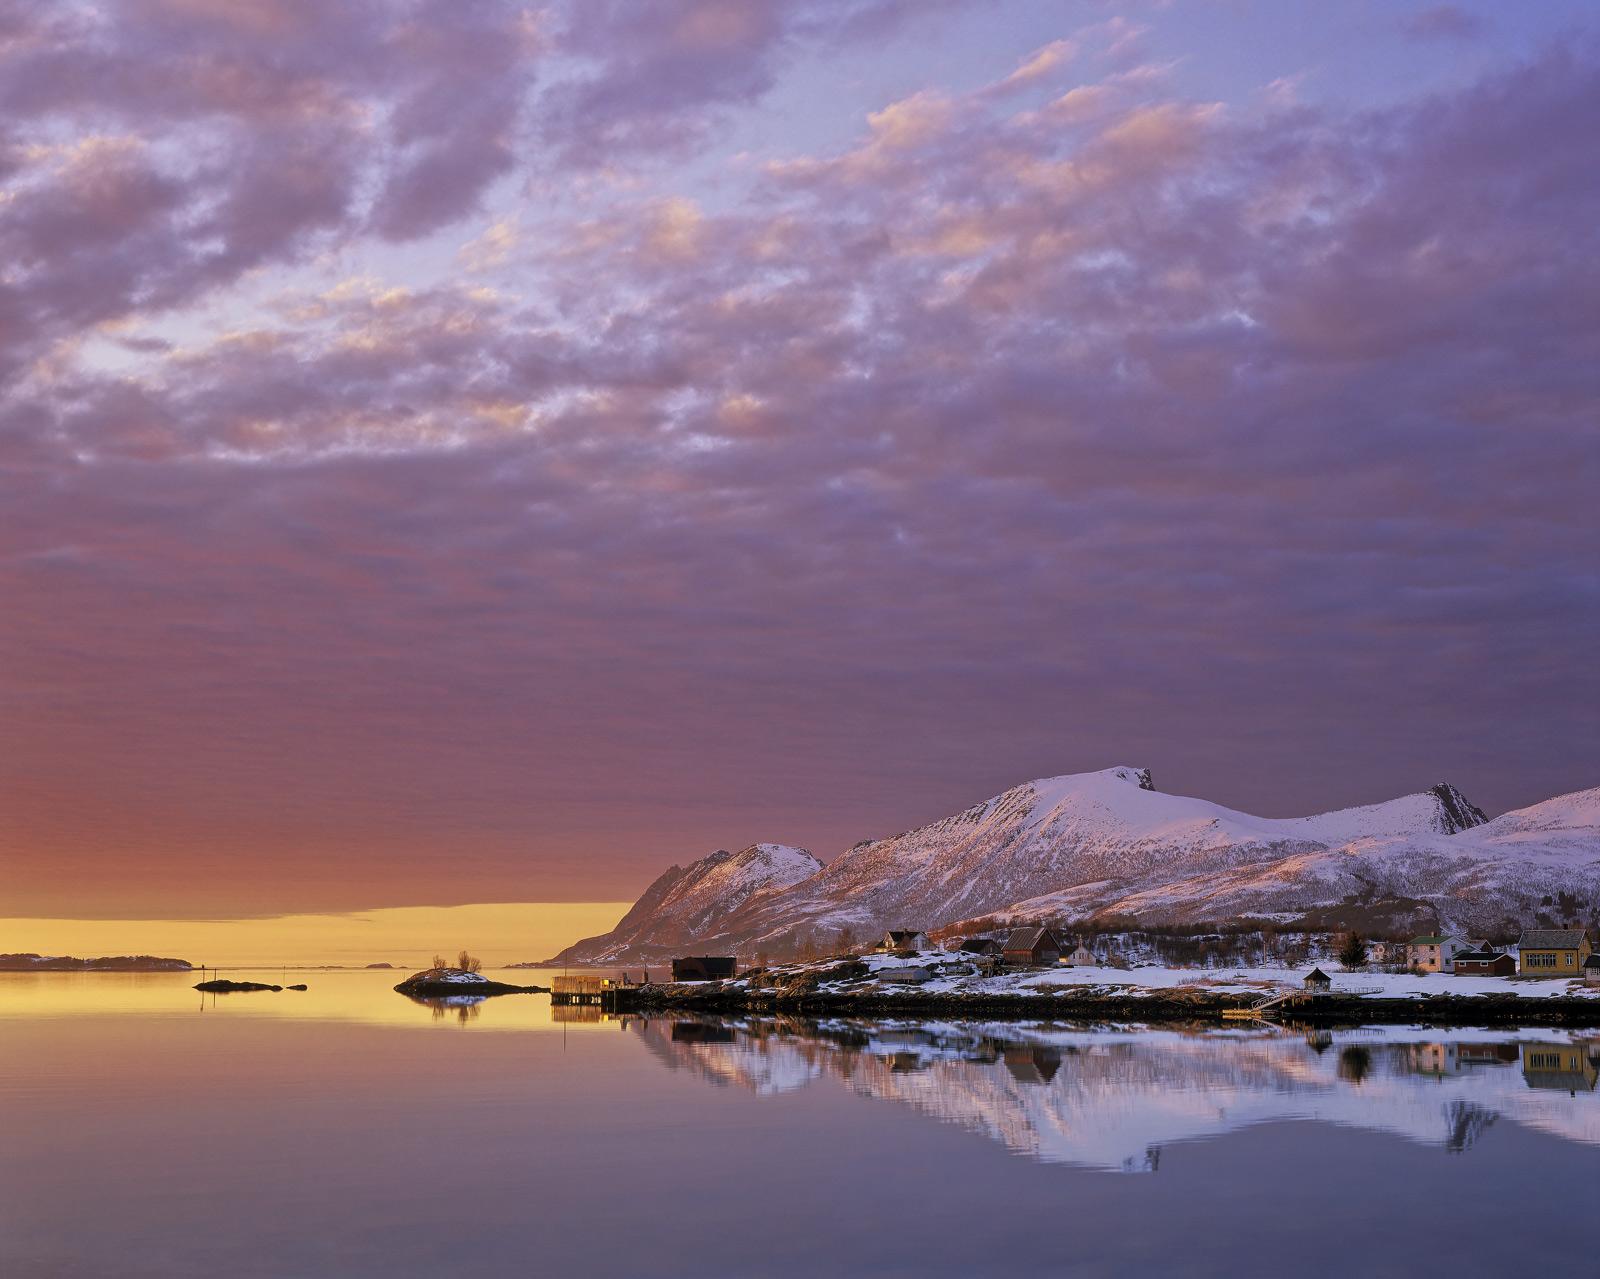 Fading Light Straumsnes, Straumsnes, Senja, Norway, mango, slice, lilac, clouds, sunset, dusk, peaks, snow, winter, refl, photo